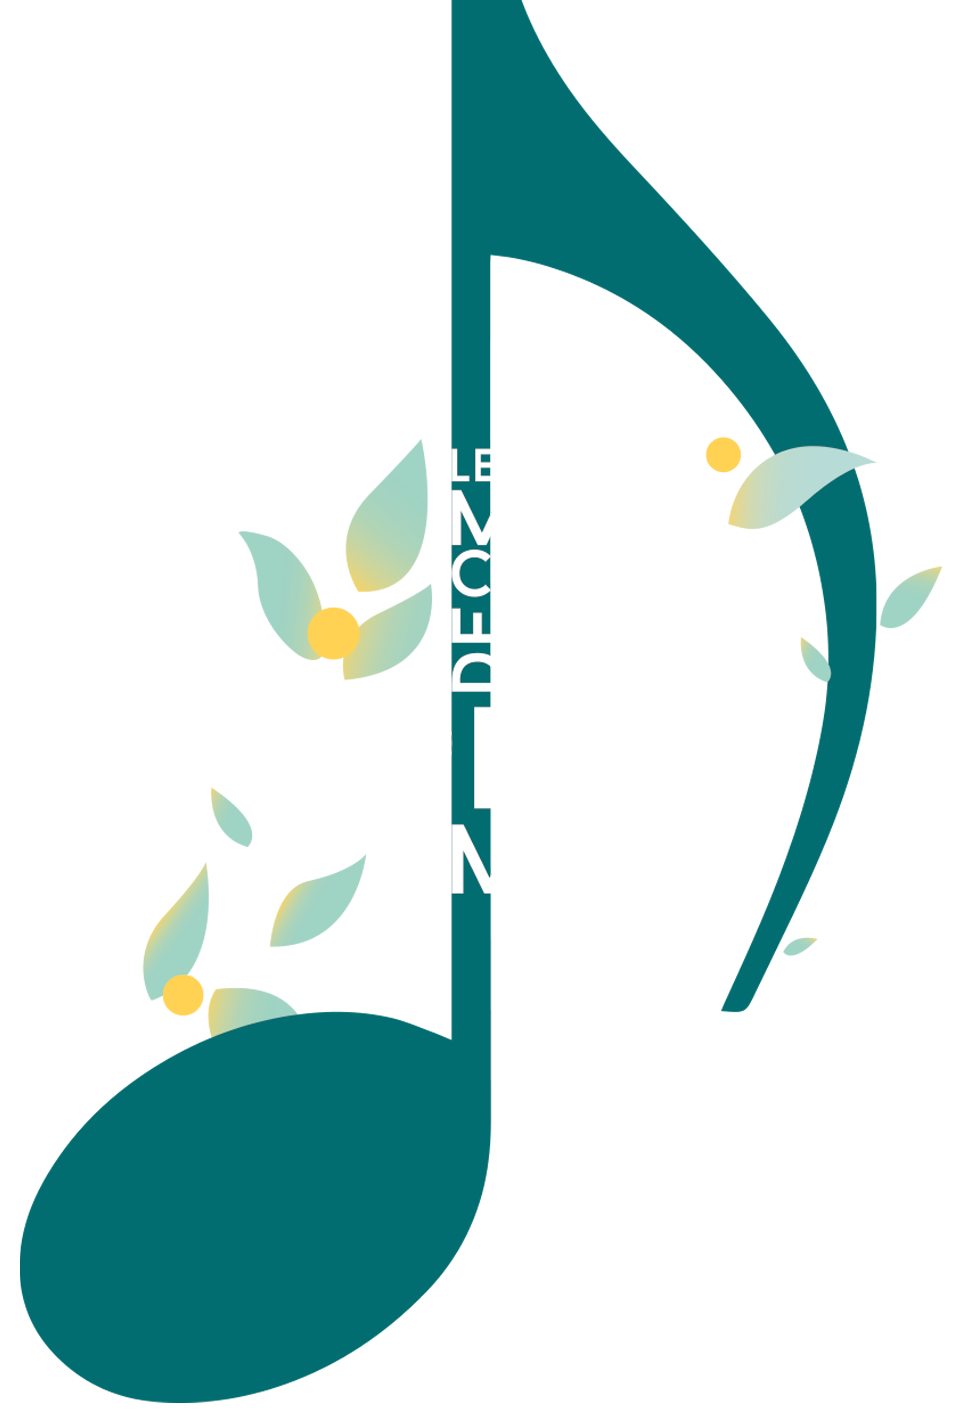 logo Les Musicales de la font de mai 2020